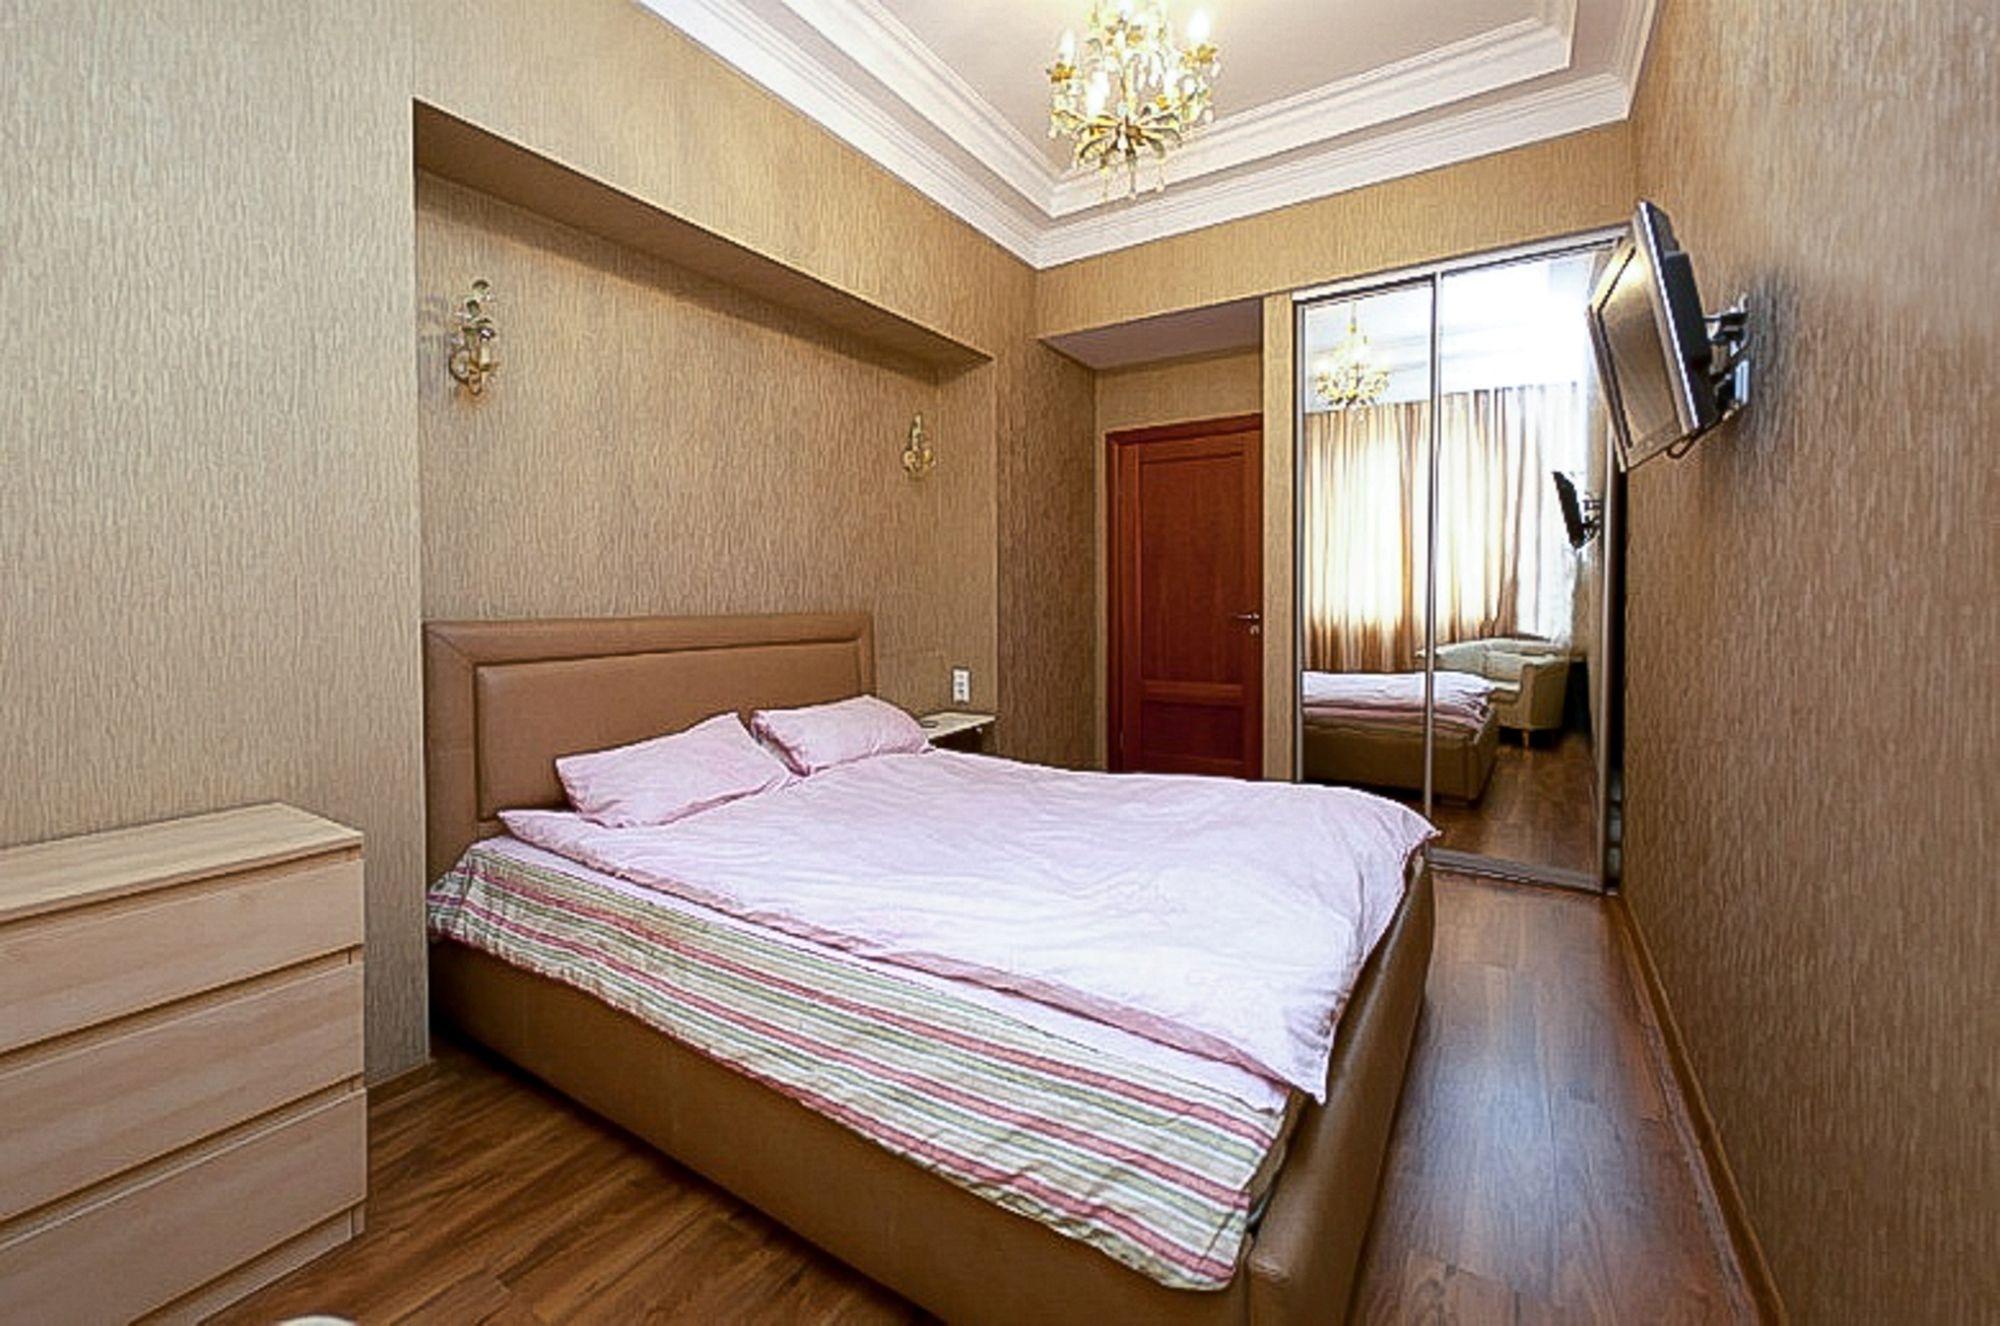 Apartment in Kirochnaya